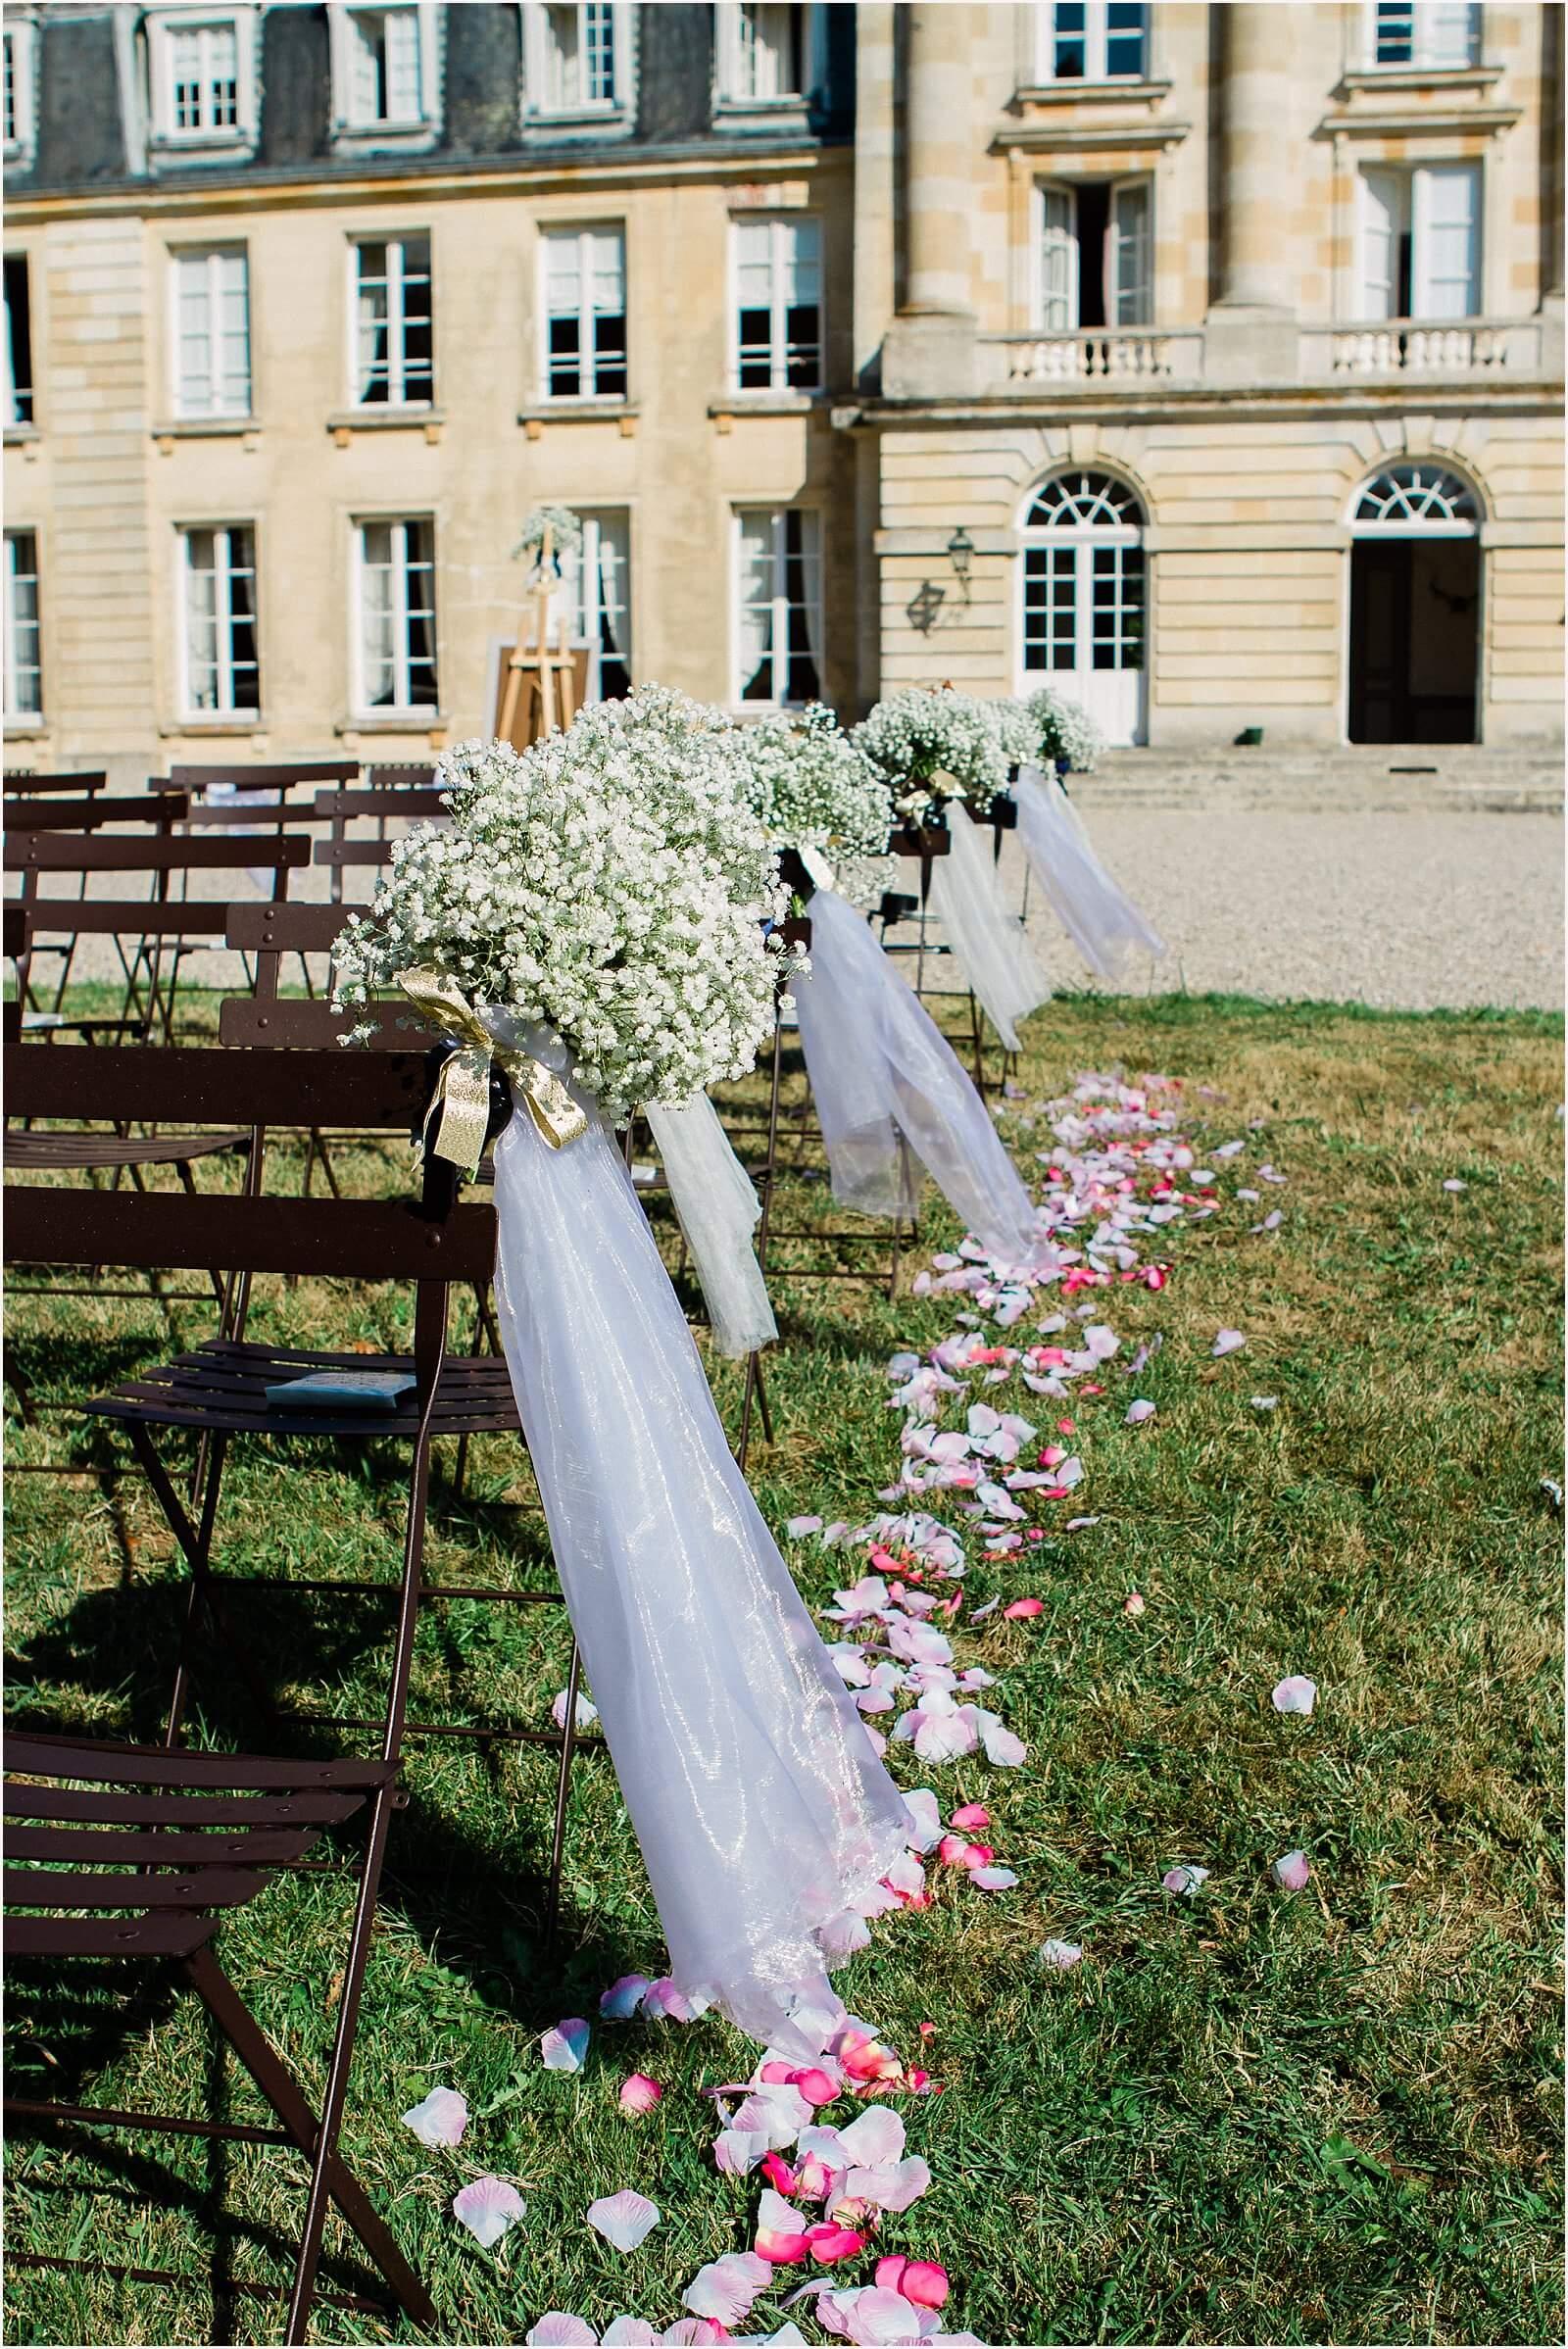 Chateau de Courtomer Wedding | Chantel & Evan 14